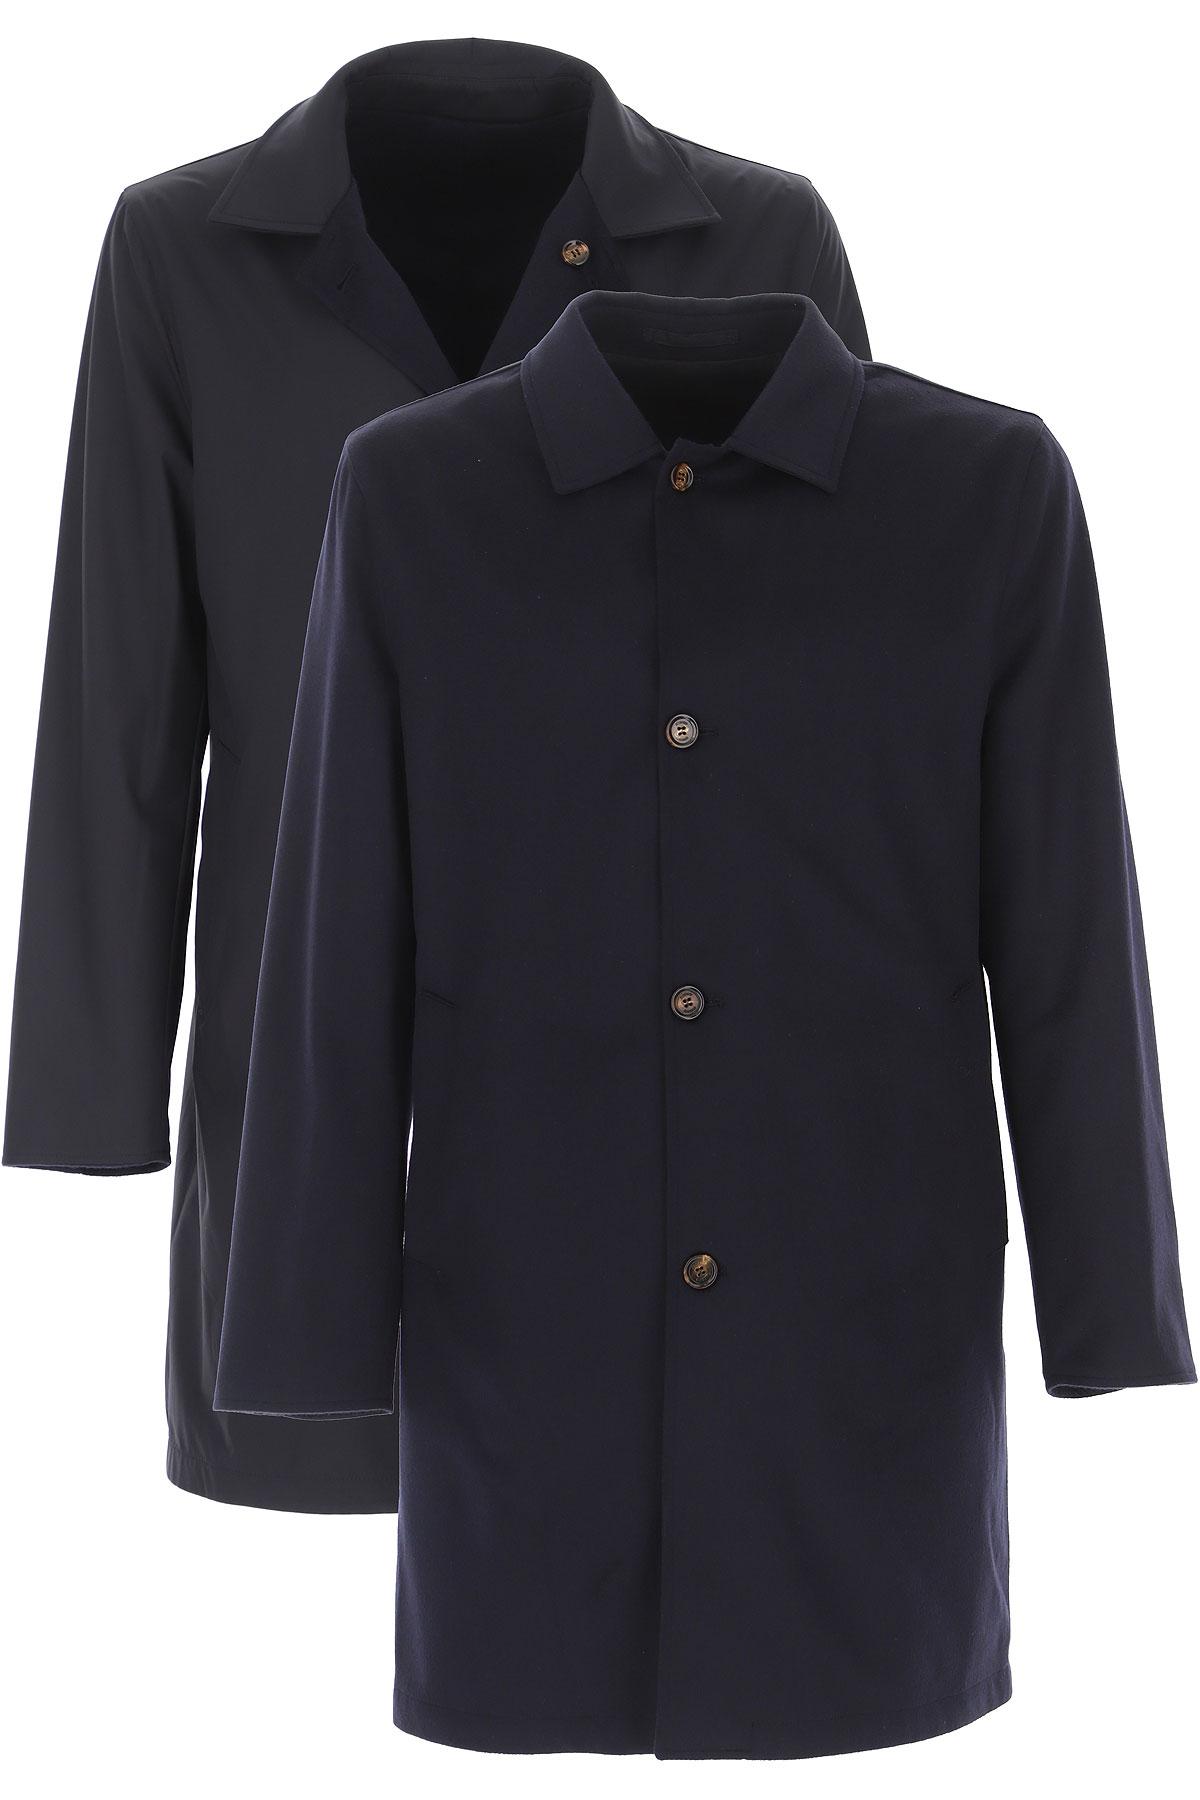 Kired Men's Coat On Sale, navy, Cashemere, 2019, M XXL